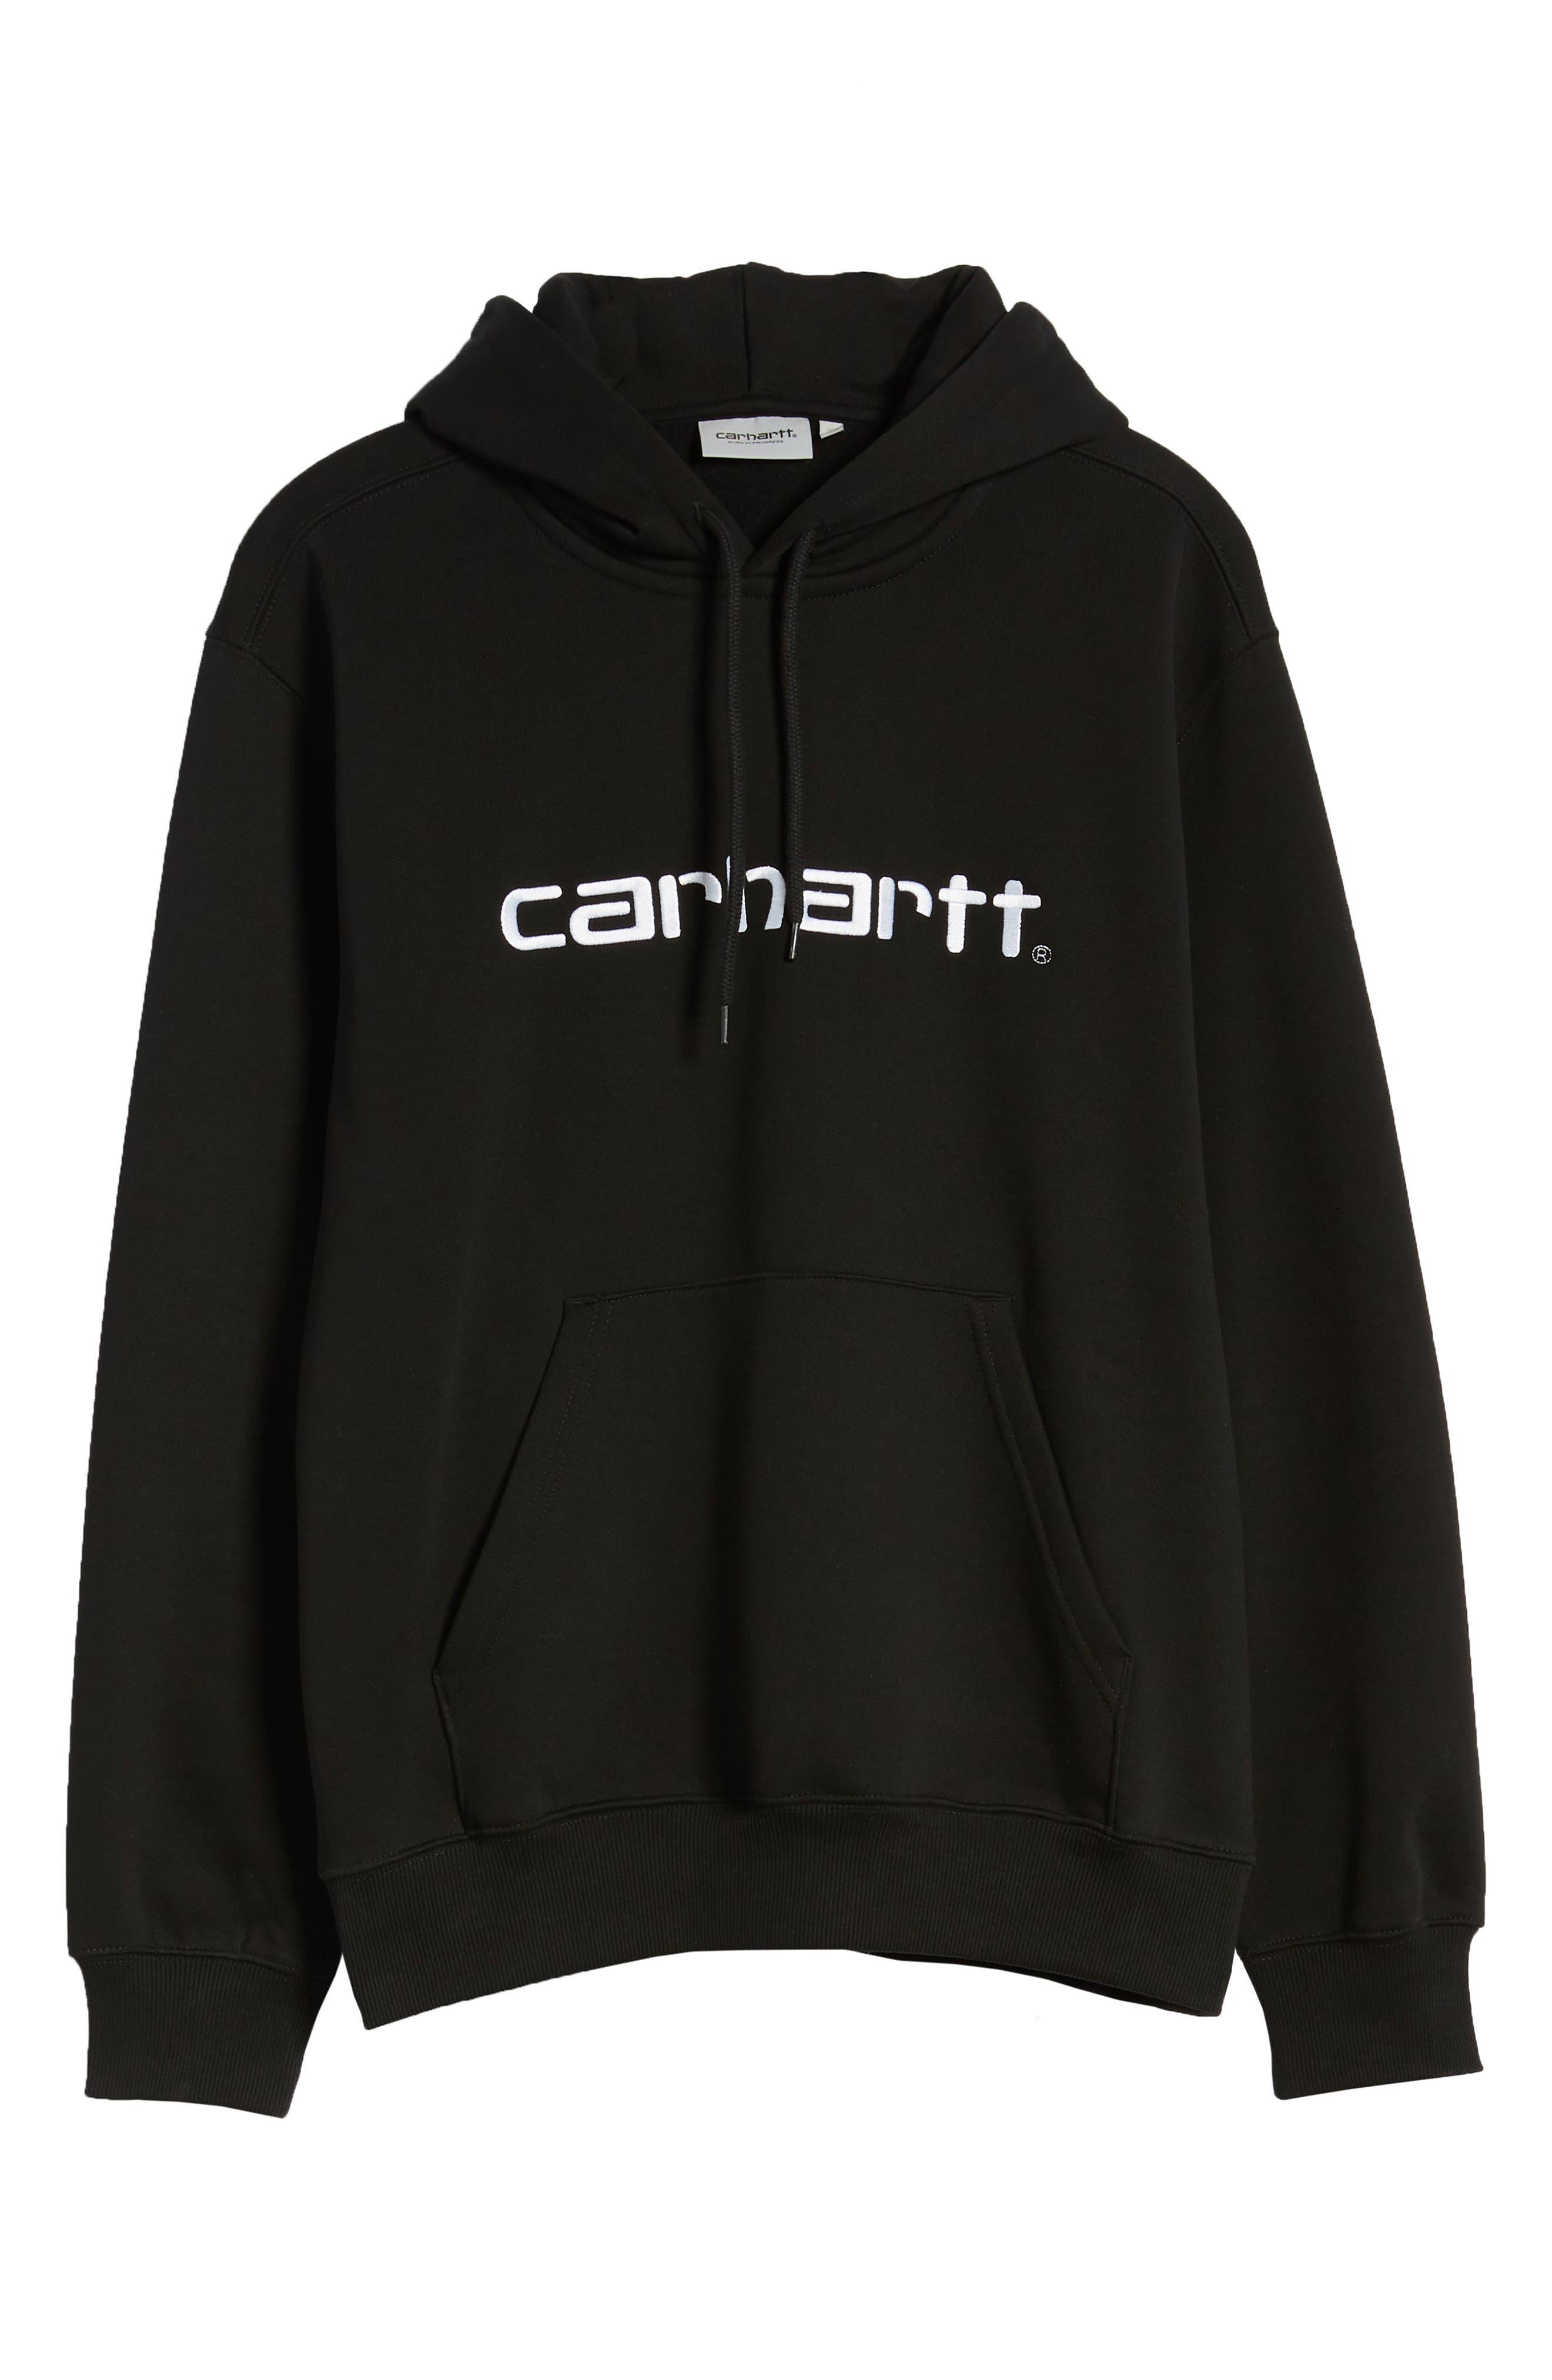 CARHARTT WORK IN PROGRESS, Logo Embroidered Hooded Sweatshirt, Alternate thumbnail 6, color, BLACK / WHITE